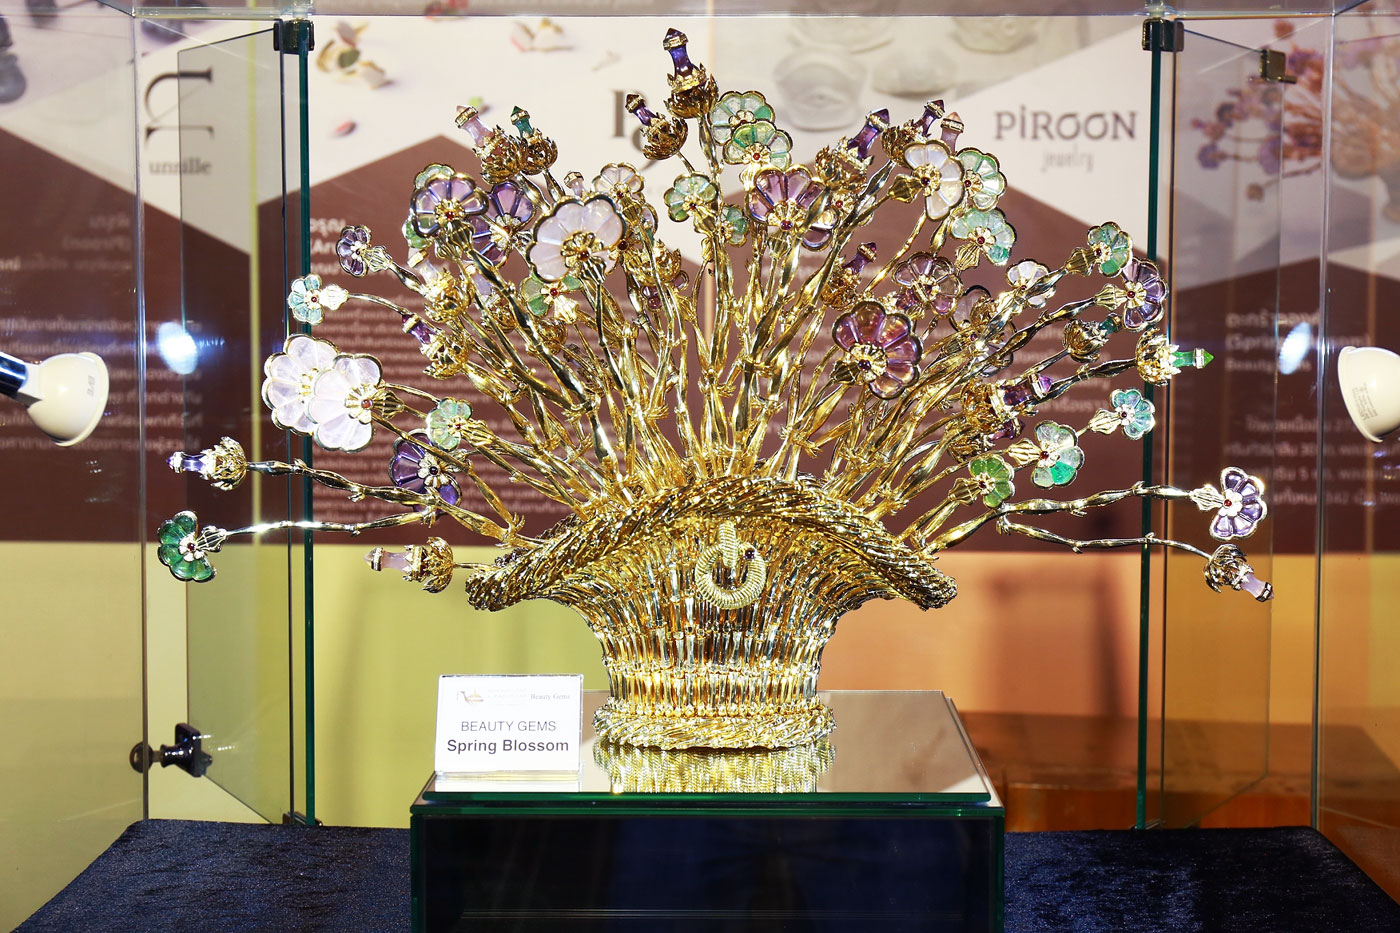 63rd Bangkok Gems & Jewelry Fair